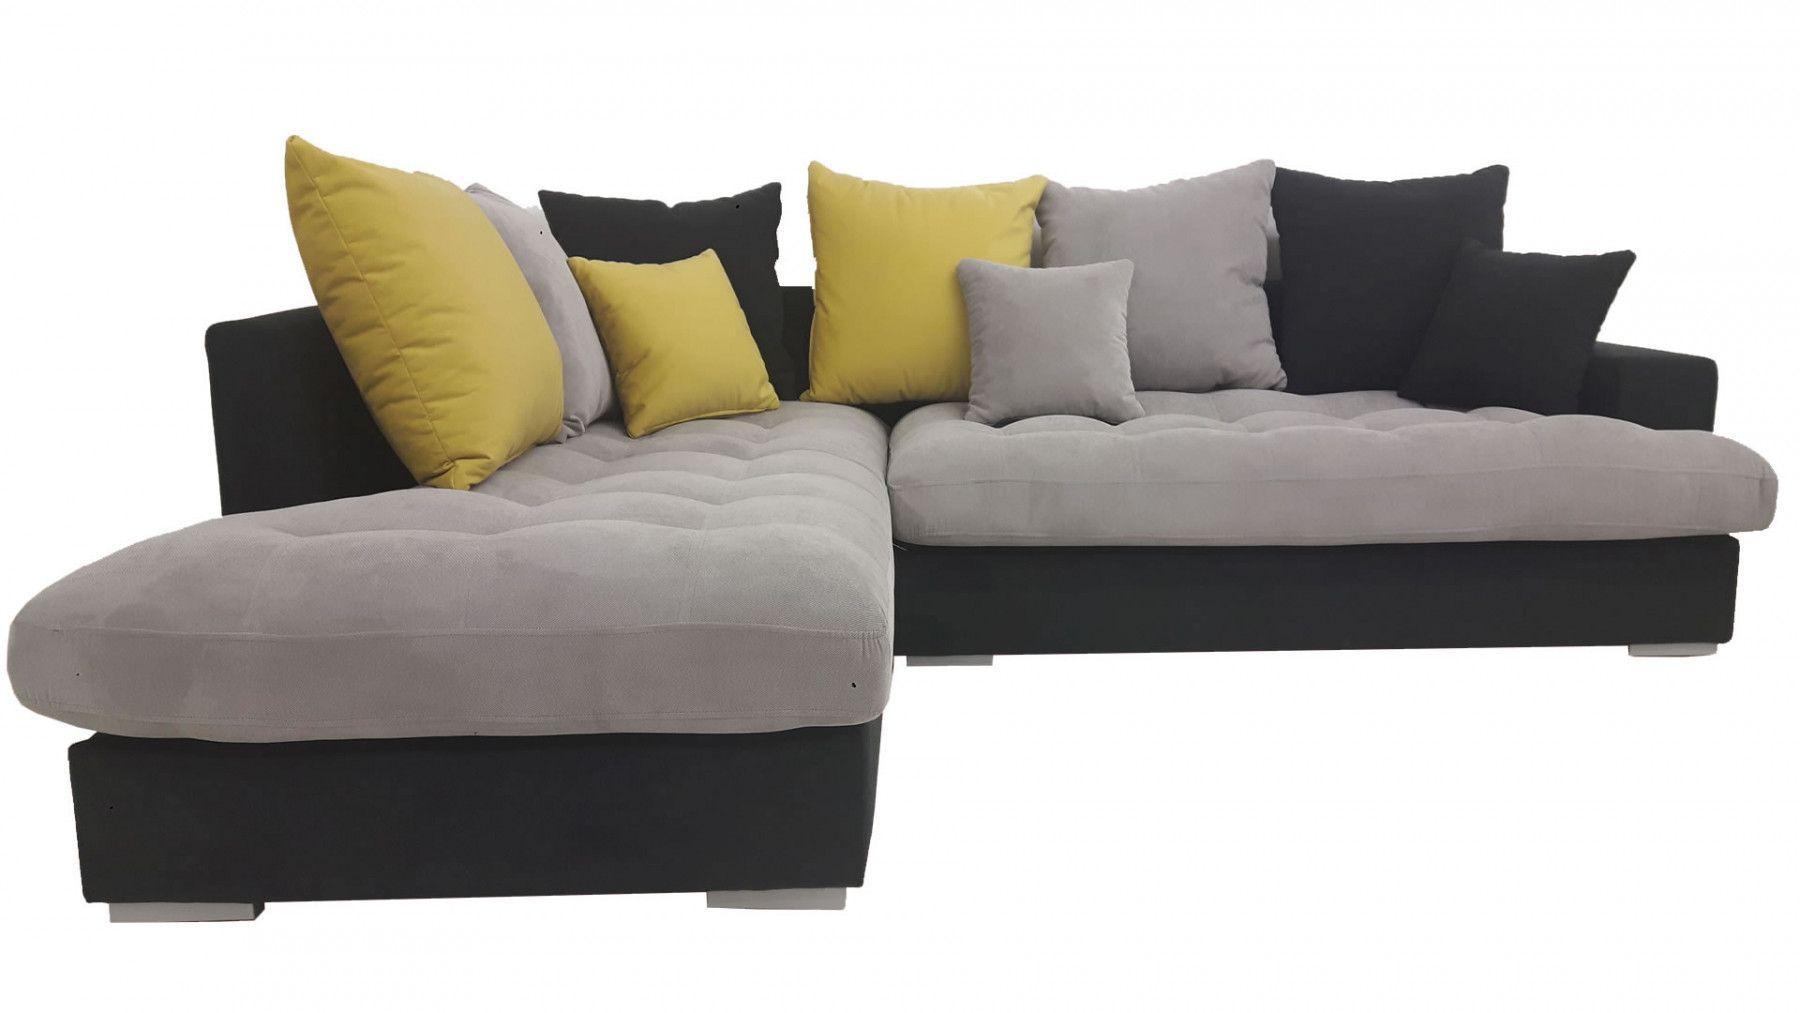 canap d 39 angle gauche minda gris et jaune. Black Bedroom Furniture Sets. Home Design Ideas